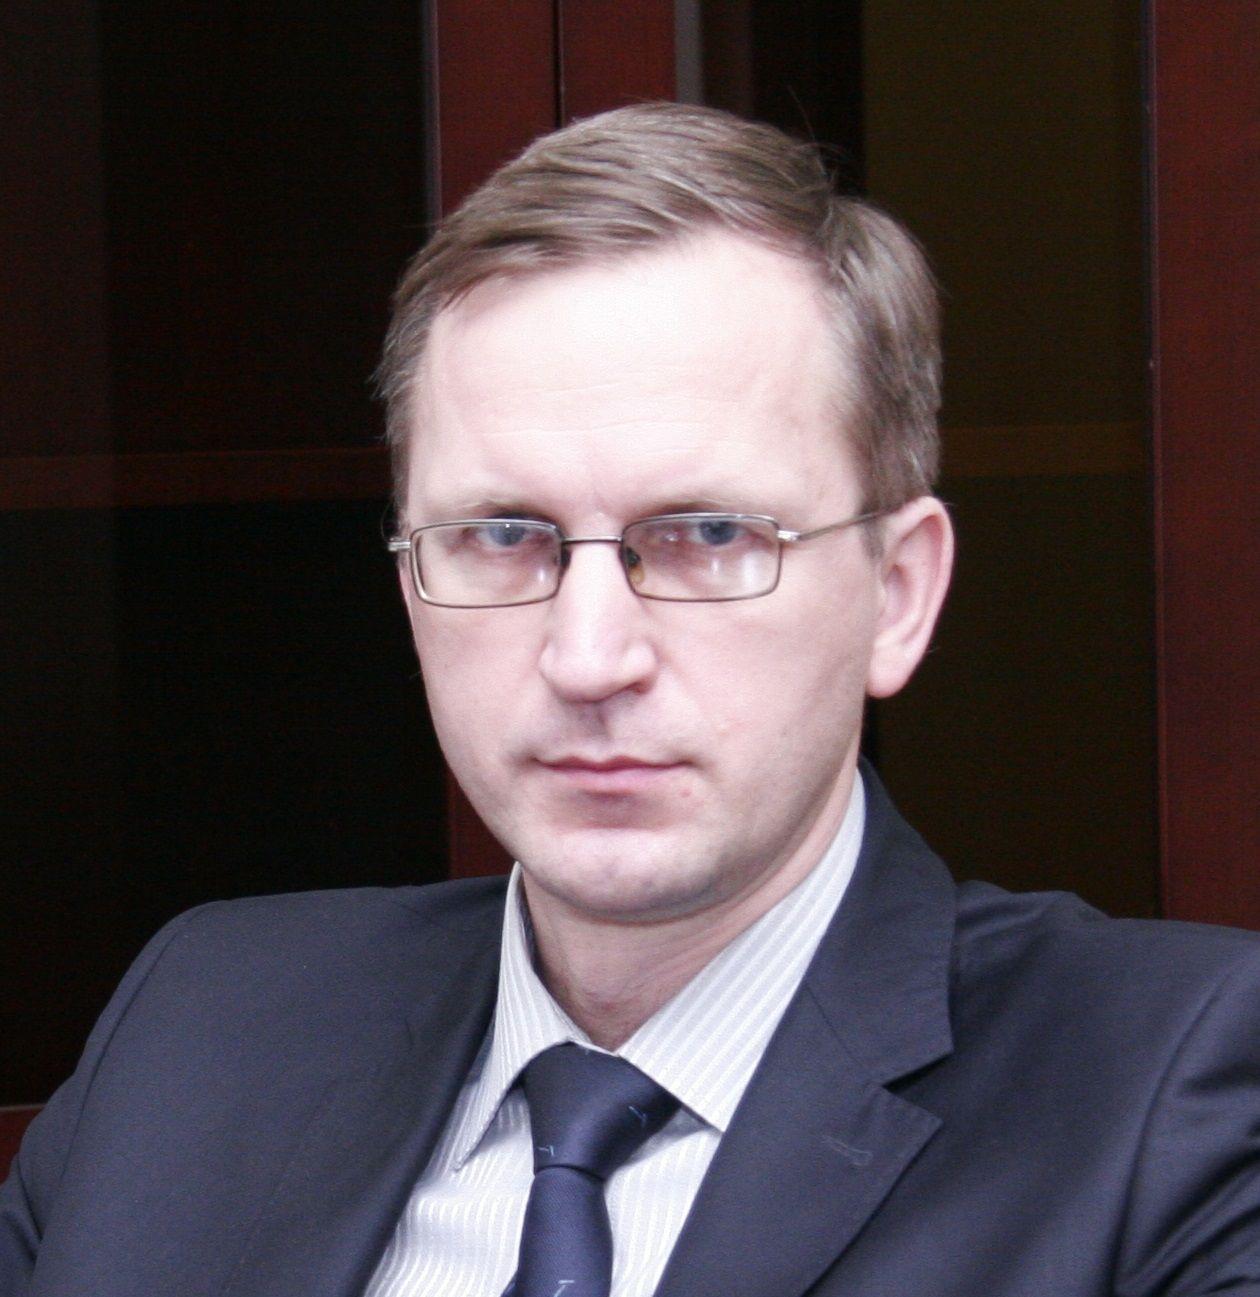 Проректором Российского университета транспорта назначен Александр Савин